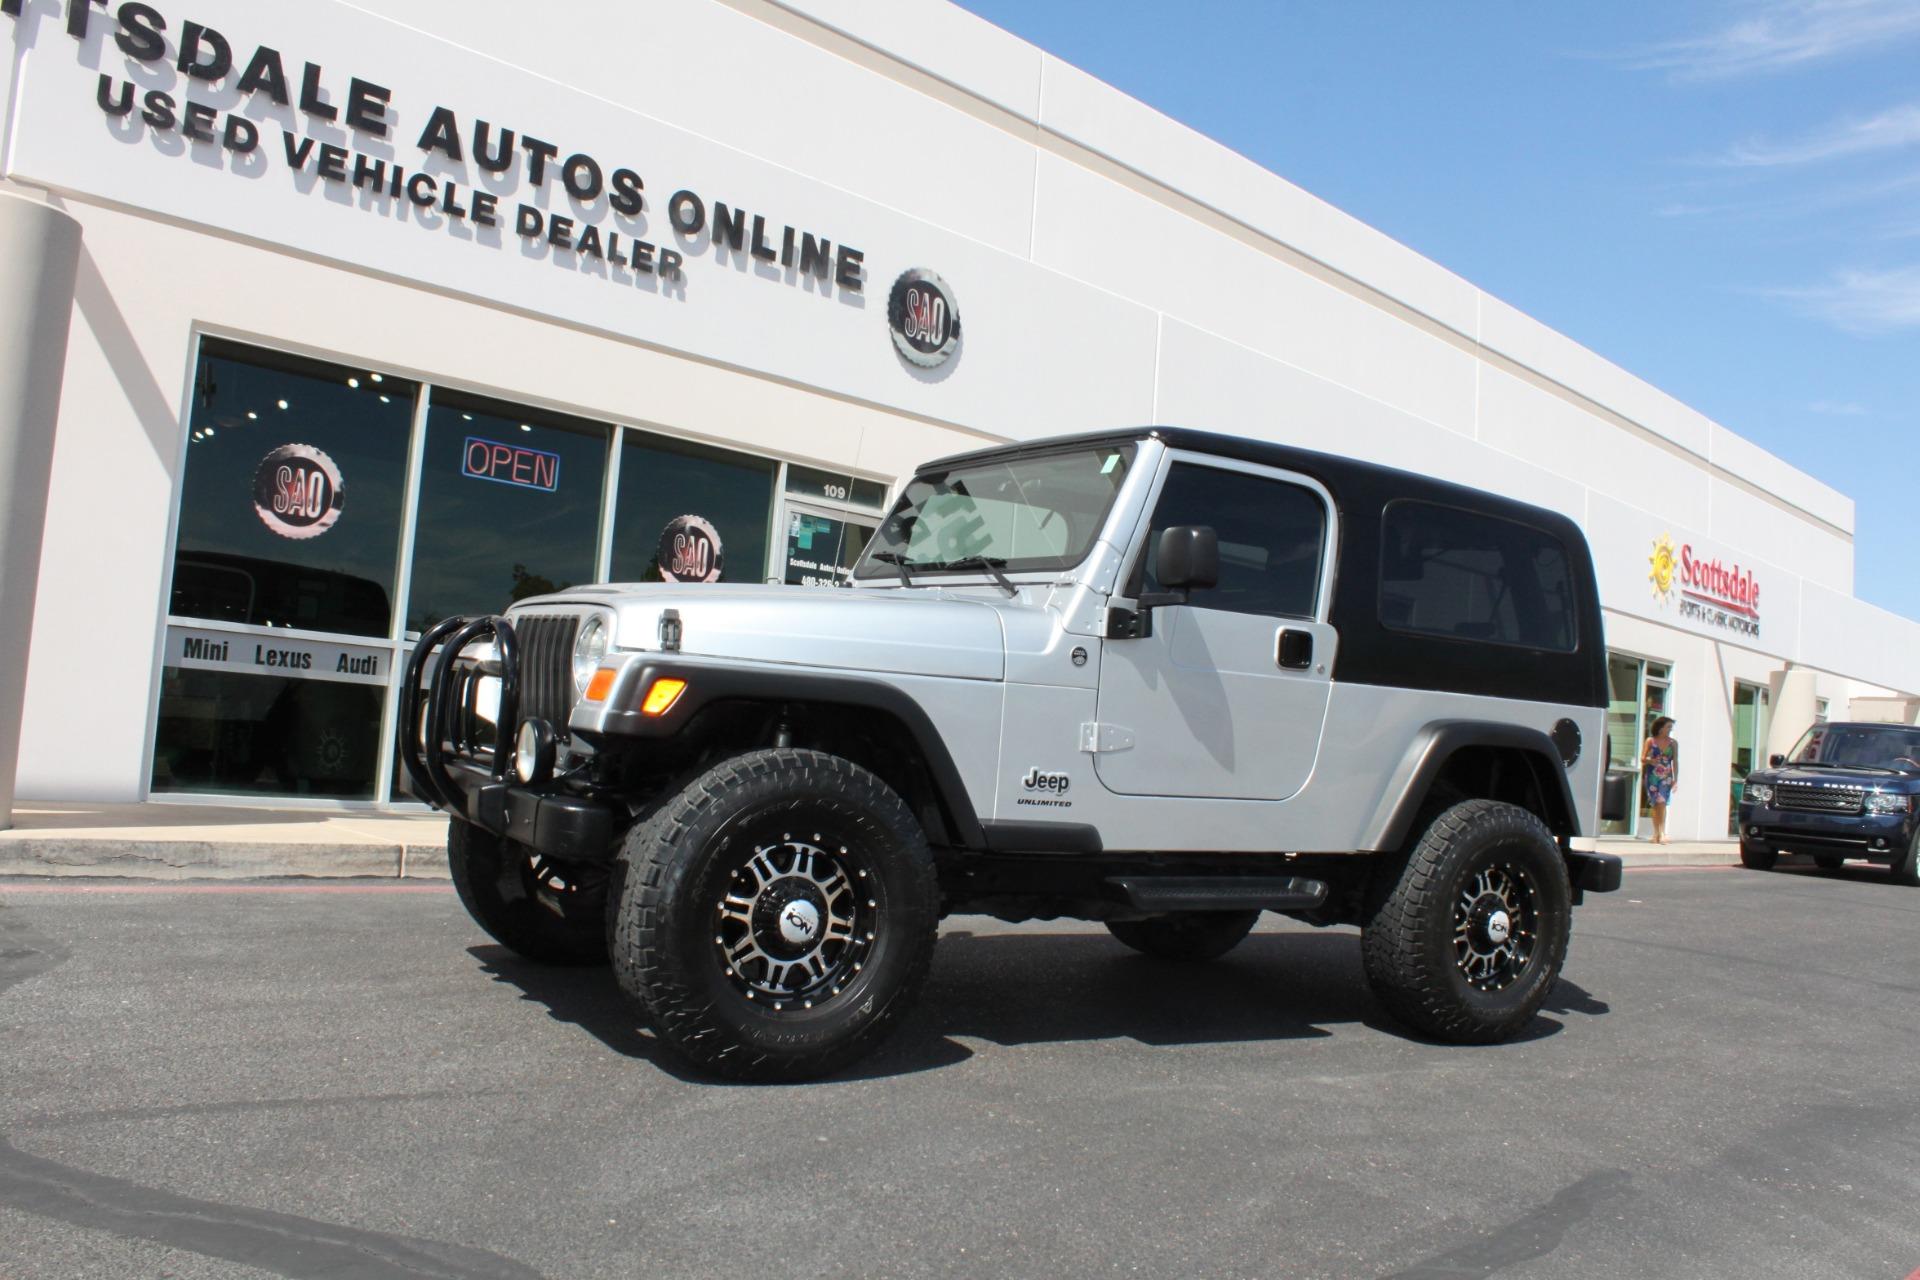 Used-2006-Jeep-Wrangler-Unlimited-LWB-Camaro